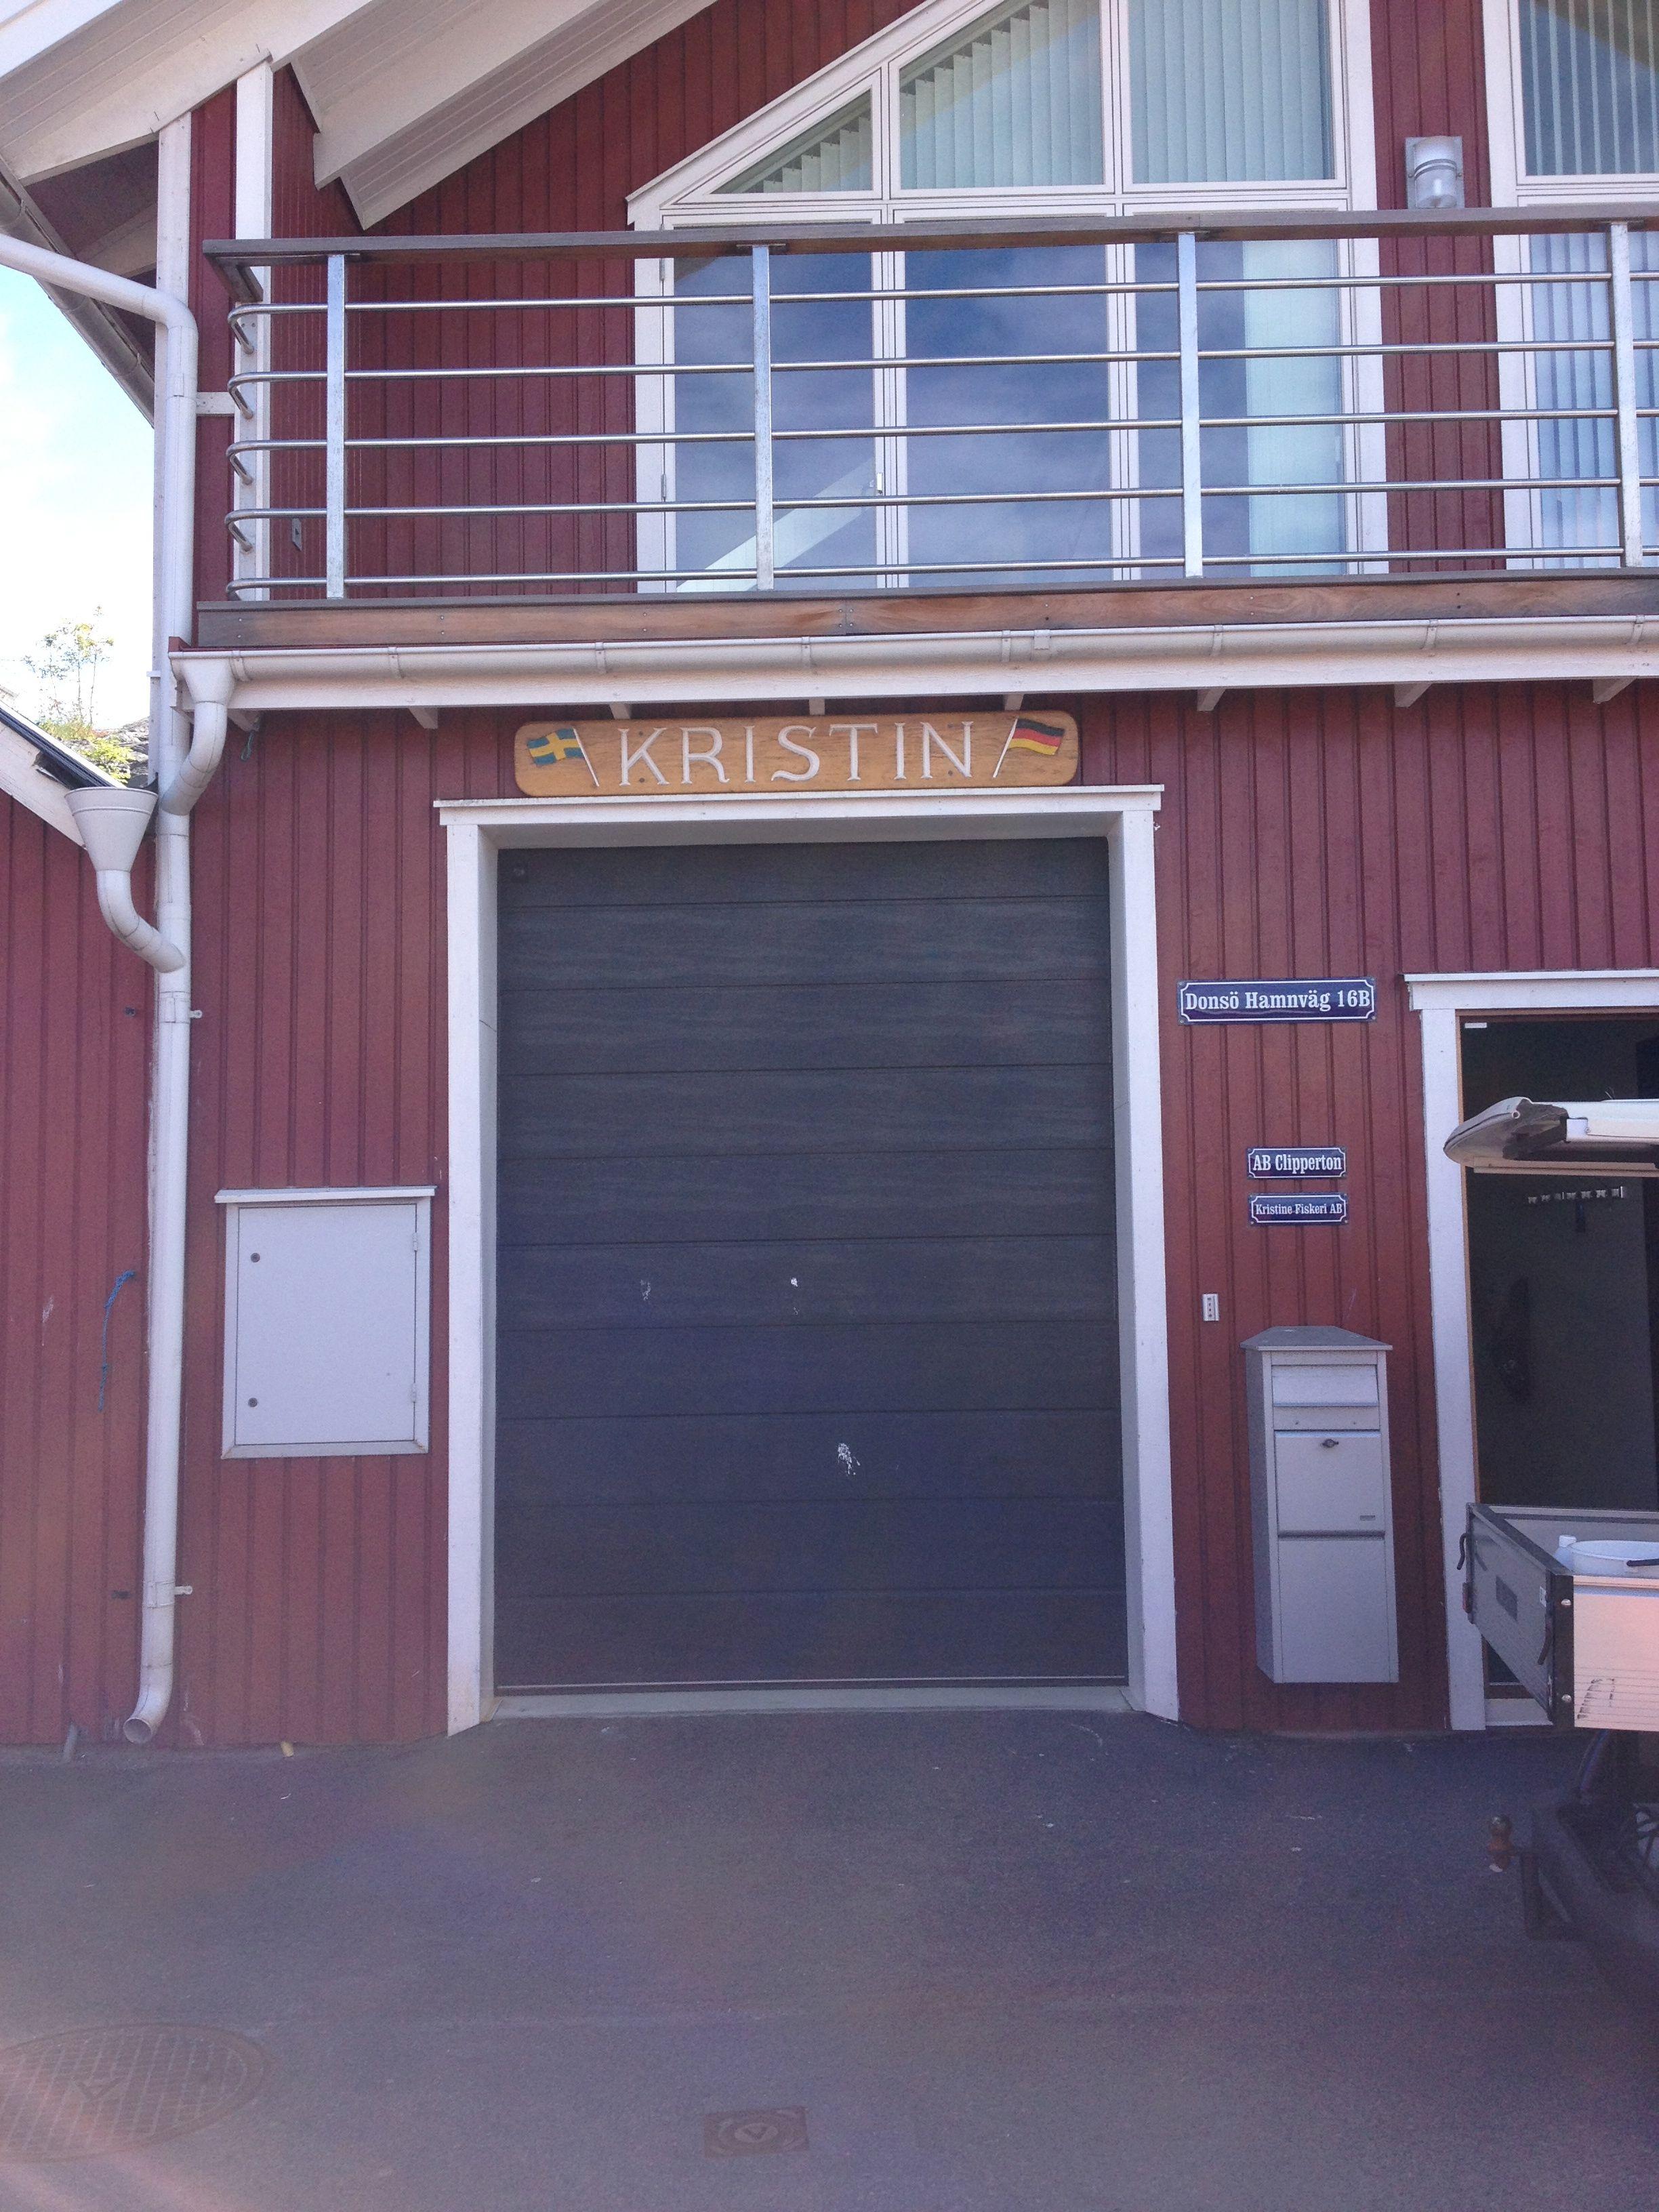 Oceanview House - Styrs Island (Gothenburg) - Villor att hyra